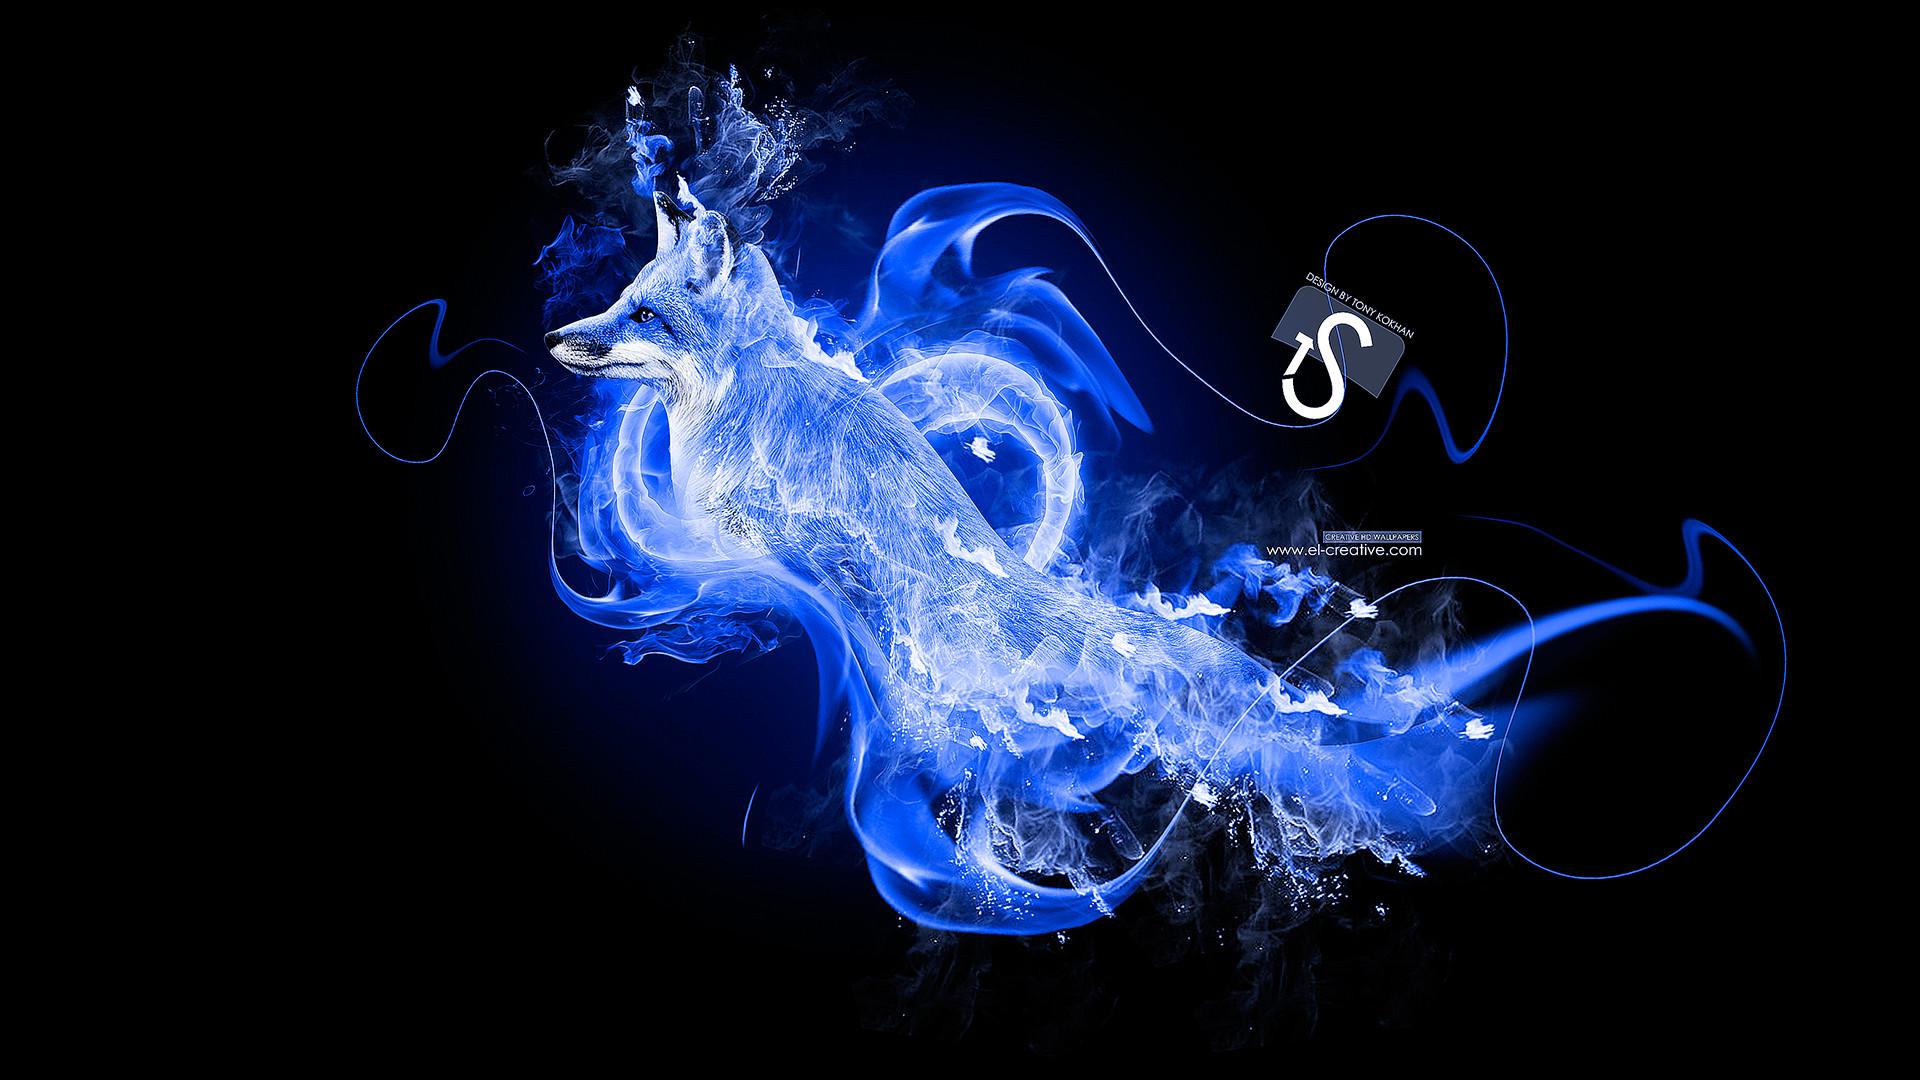 Blue-Fire-Fox-Metamorphosis-2013-HD-Wallpapers-design- …